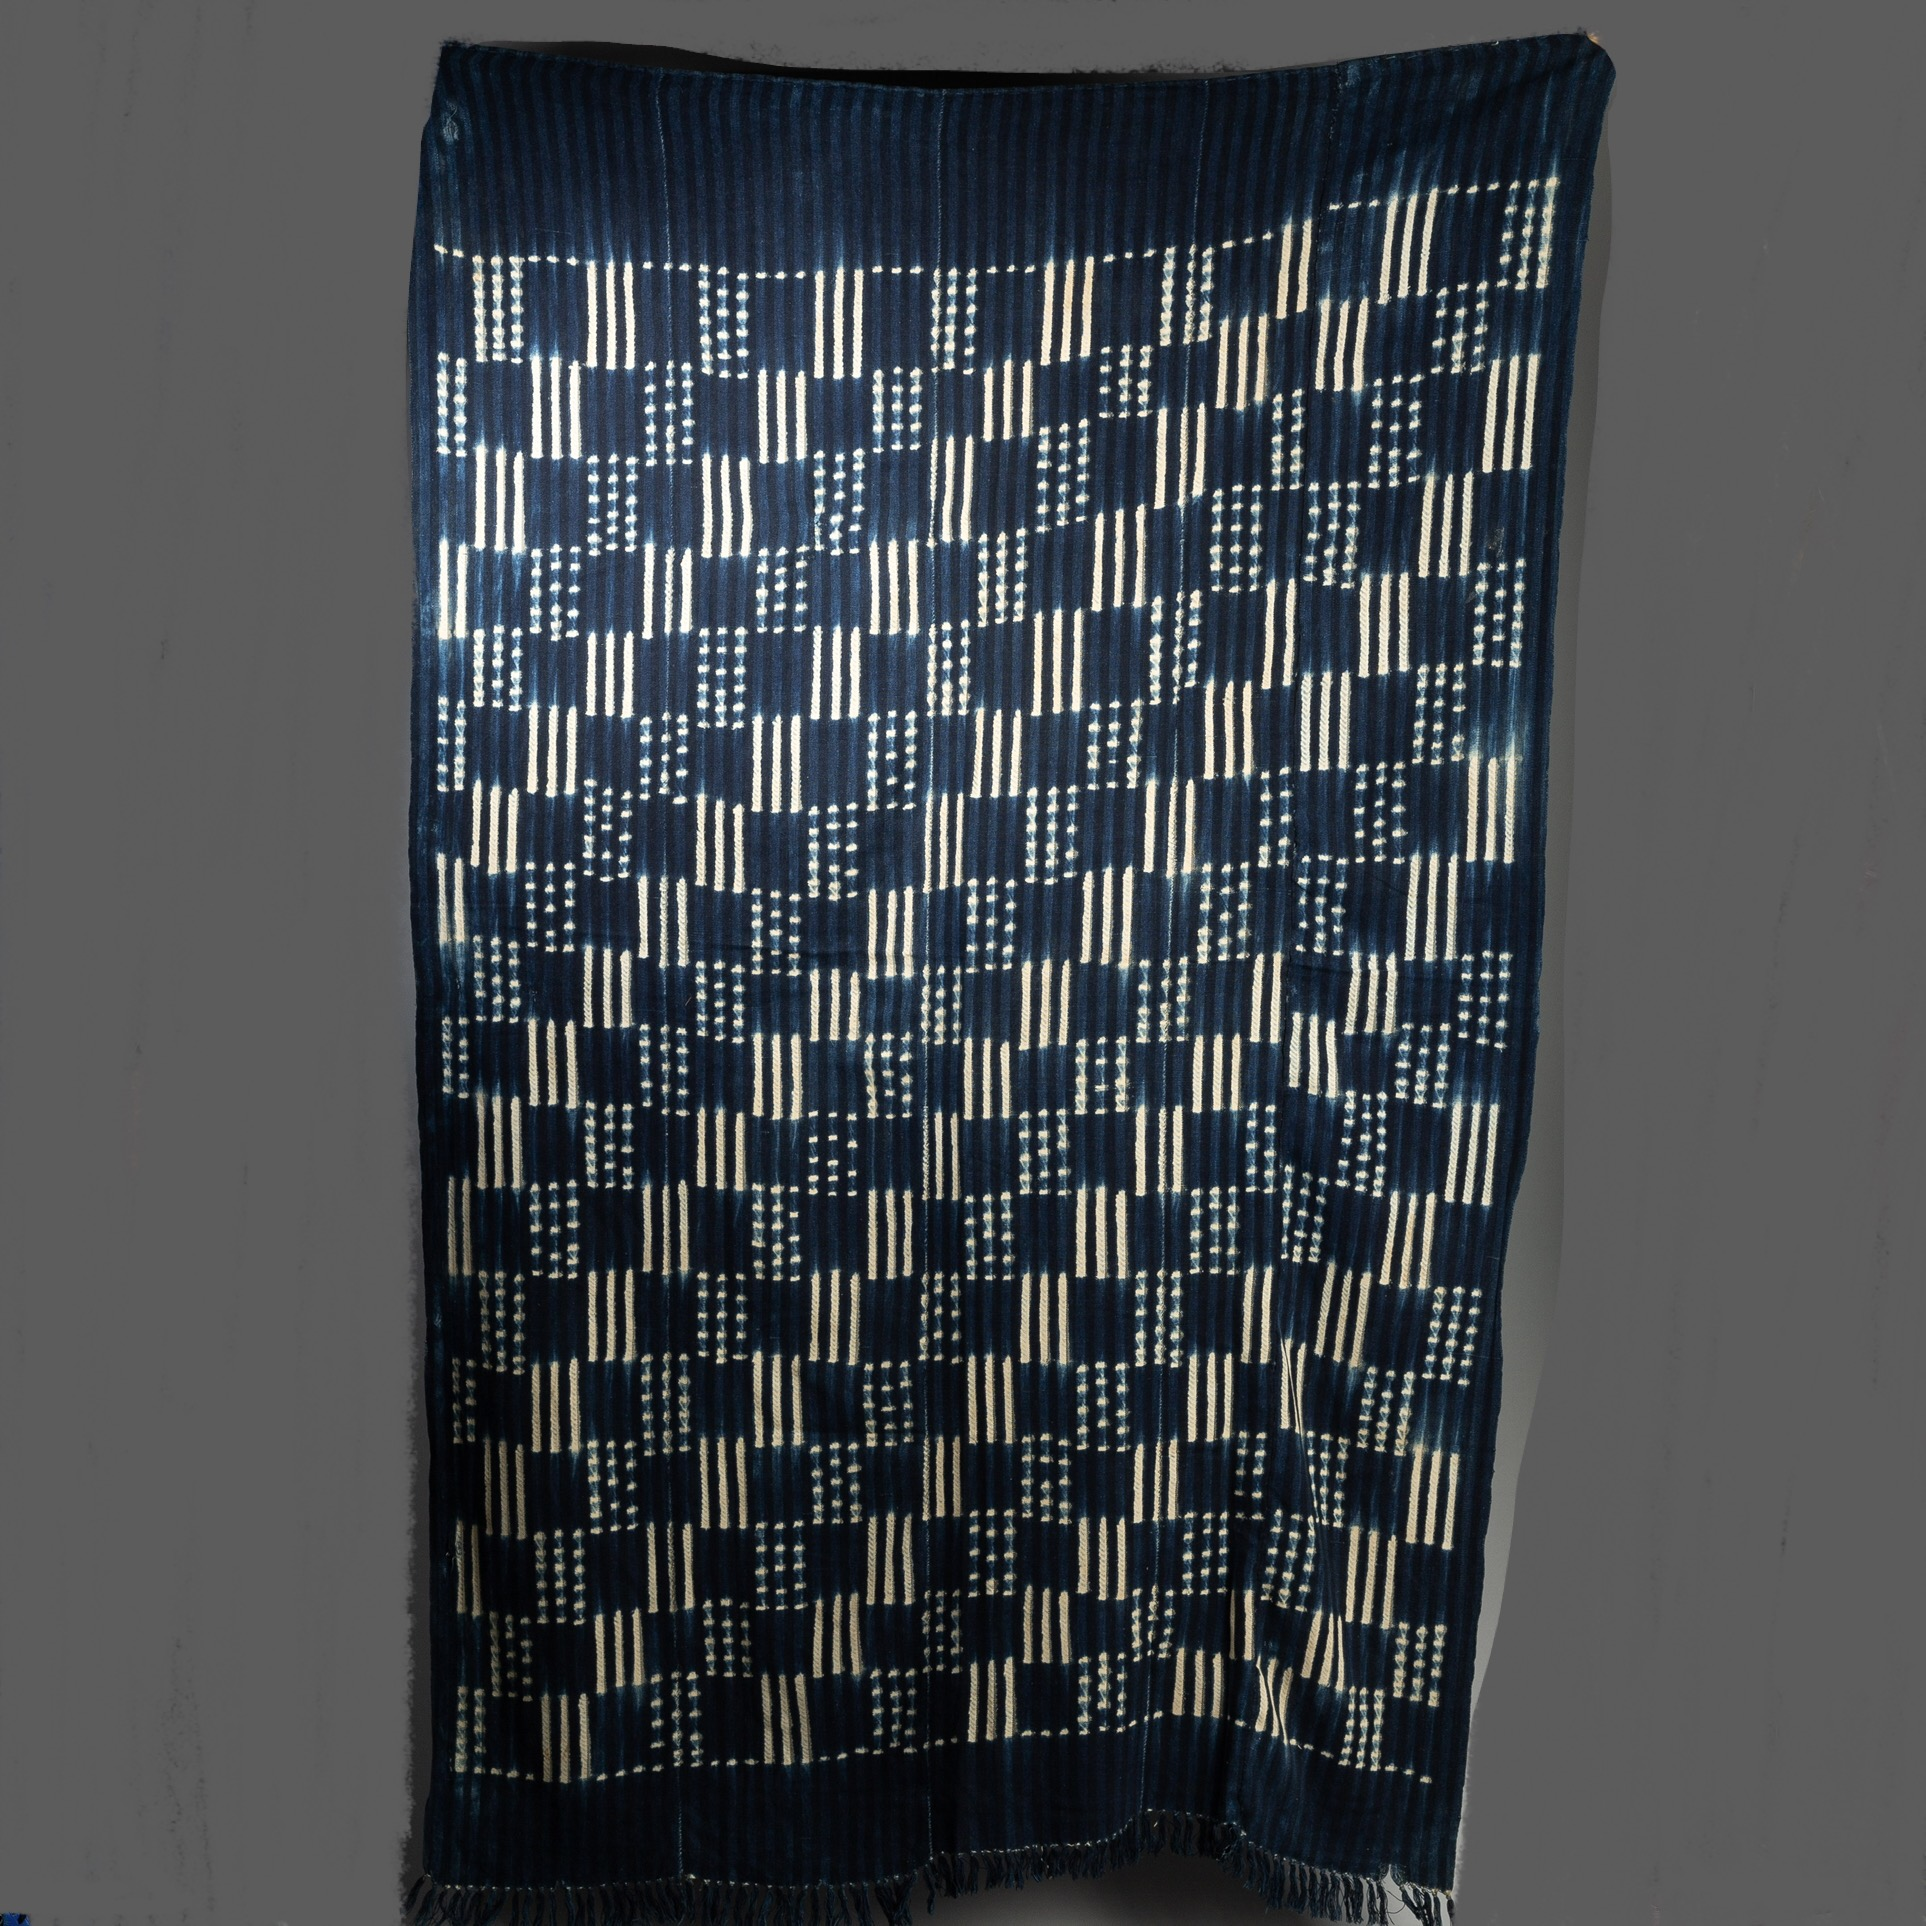 A GRAPHIC CHECK INDIGO CLOTH, BURKINA FASO ( No 3275 )